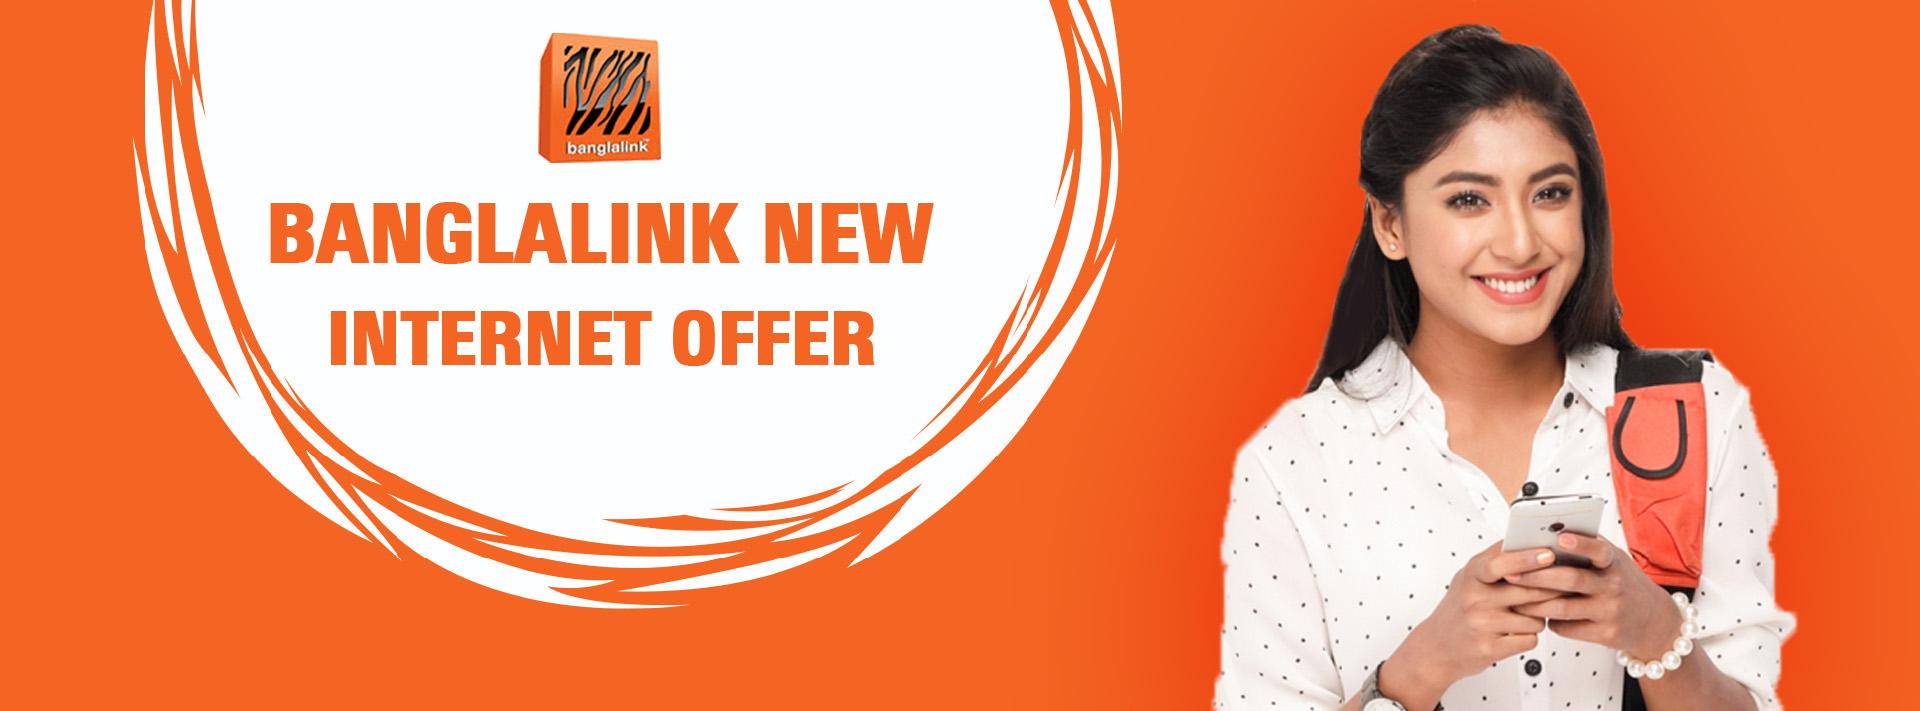 Banglalink Internet Offers